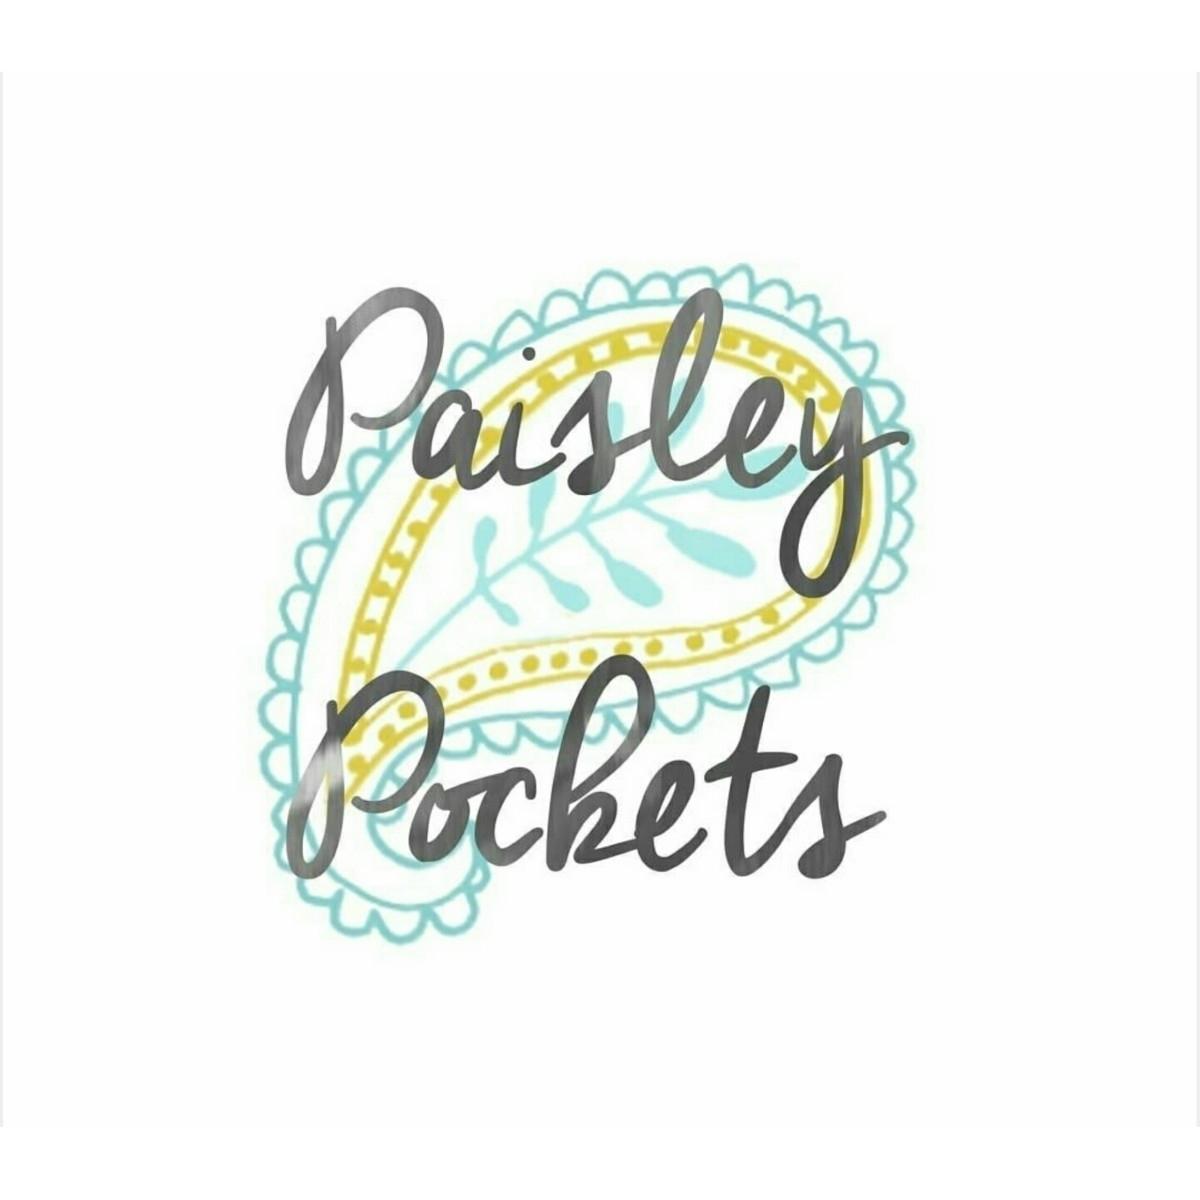 paisley pockets  (@paisleypockets) Cover Image